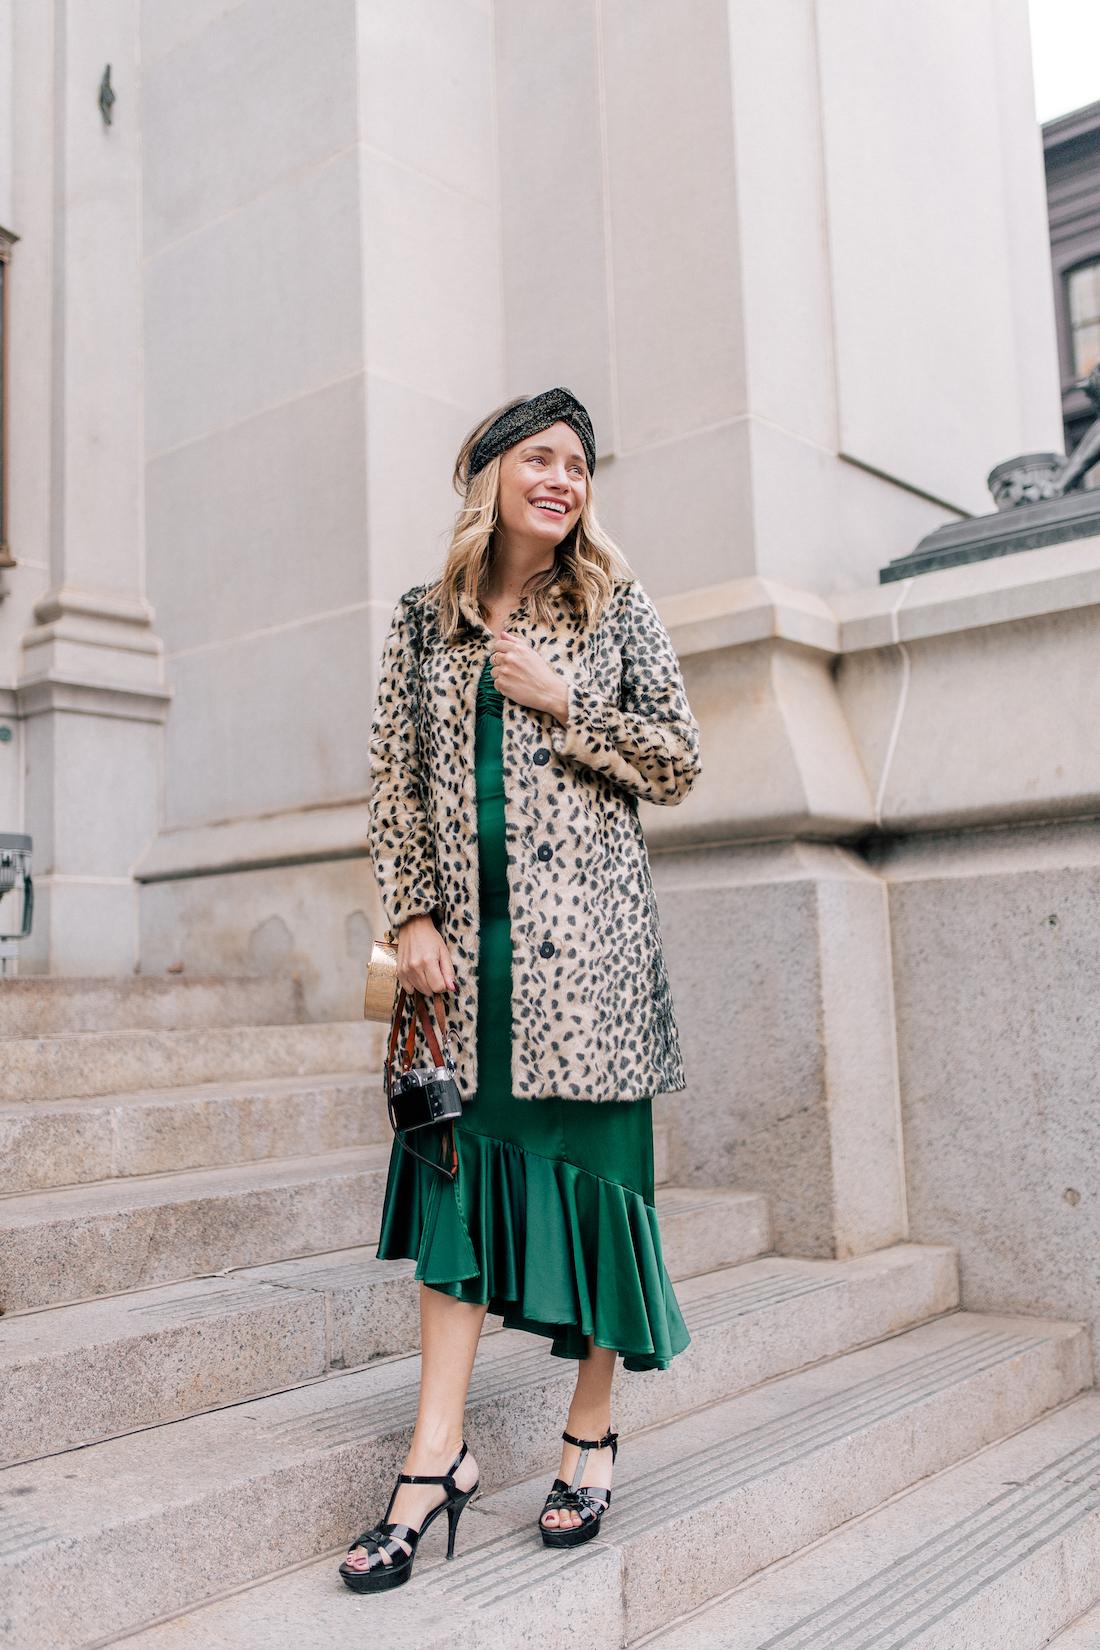 Grace Atwood Outfit Details: Viva Aviva Dress c/o// Animal Print Coat // Zara Sparkly Headband! // Saint Laurent Tribute Sandals // Okhtein Bag